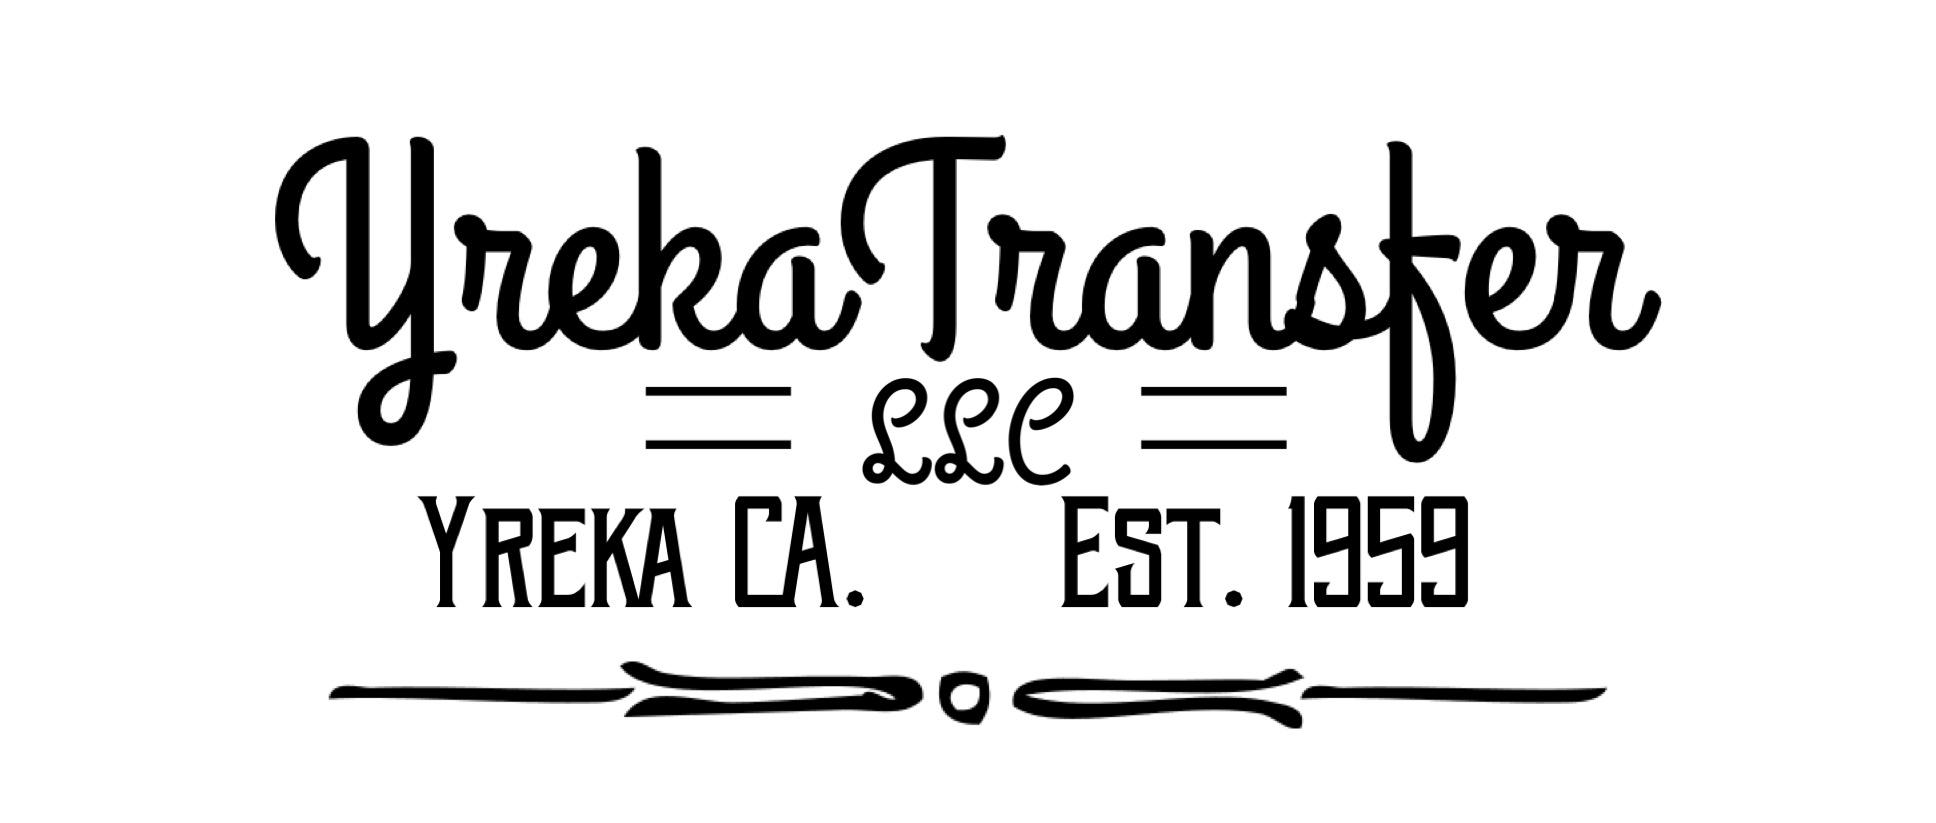 yreka transfer logo